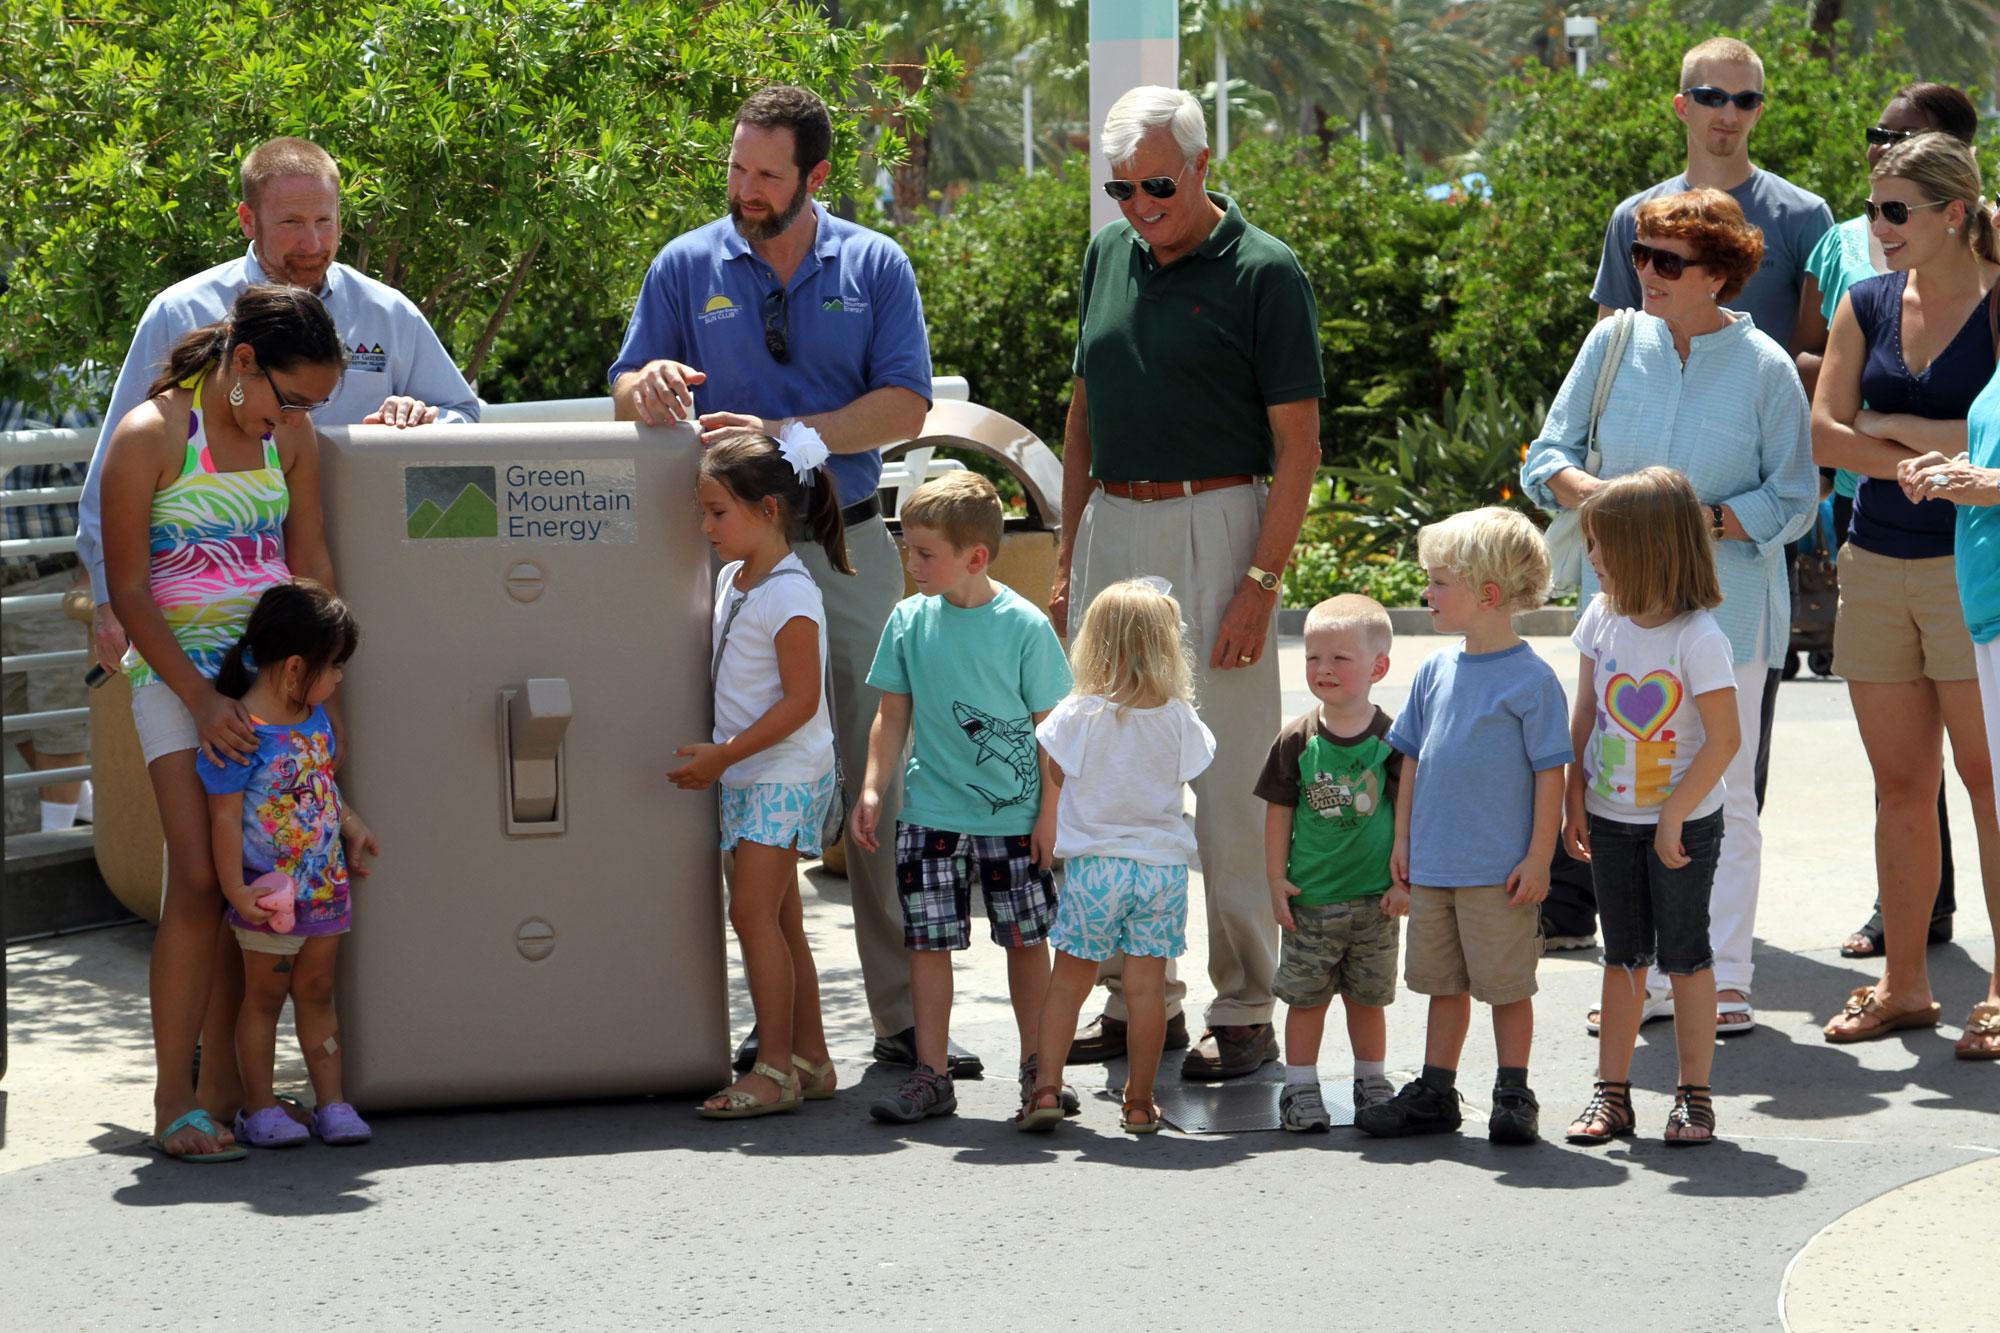 Tony Napolillo, Green Mountain Energy Sun Club program manager, talks about their program and their donation